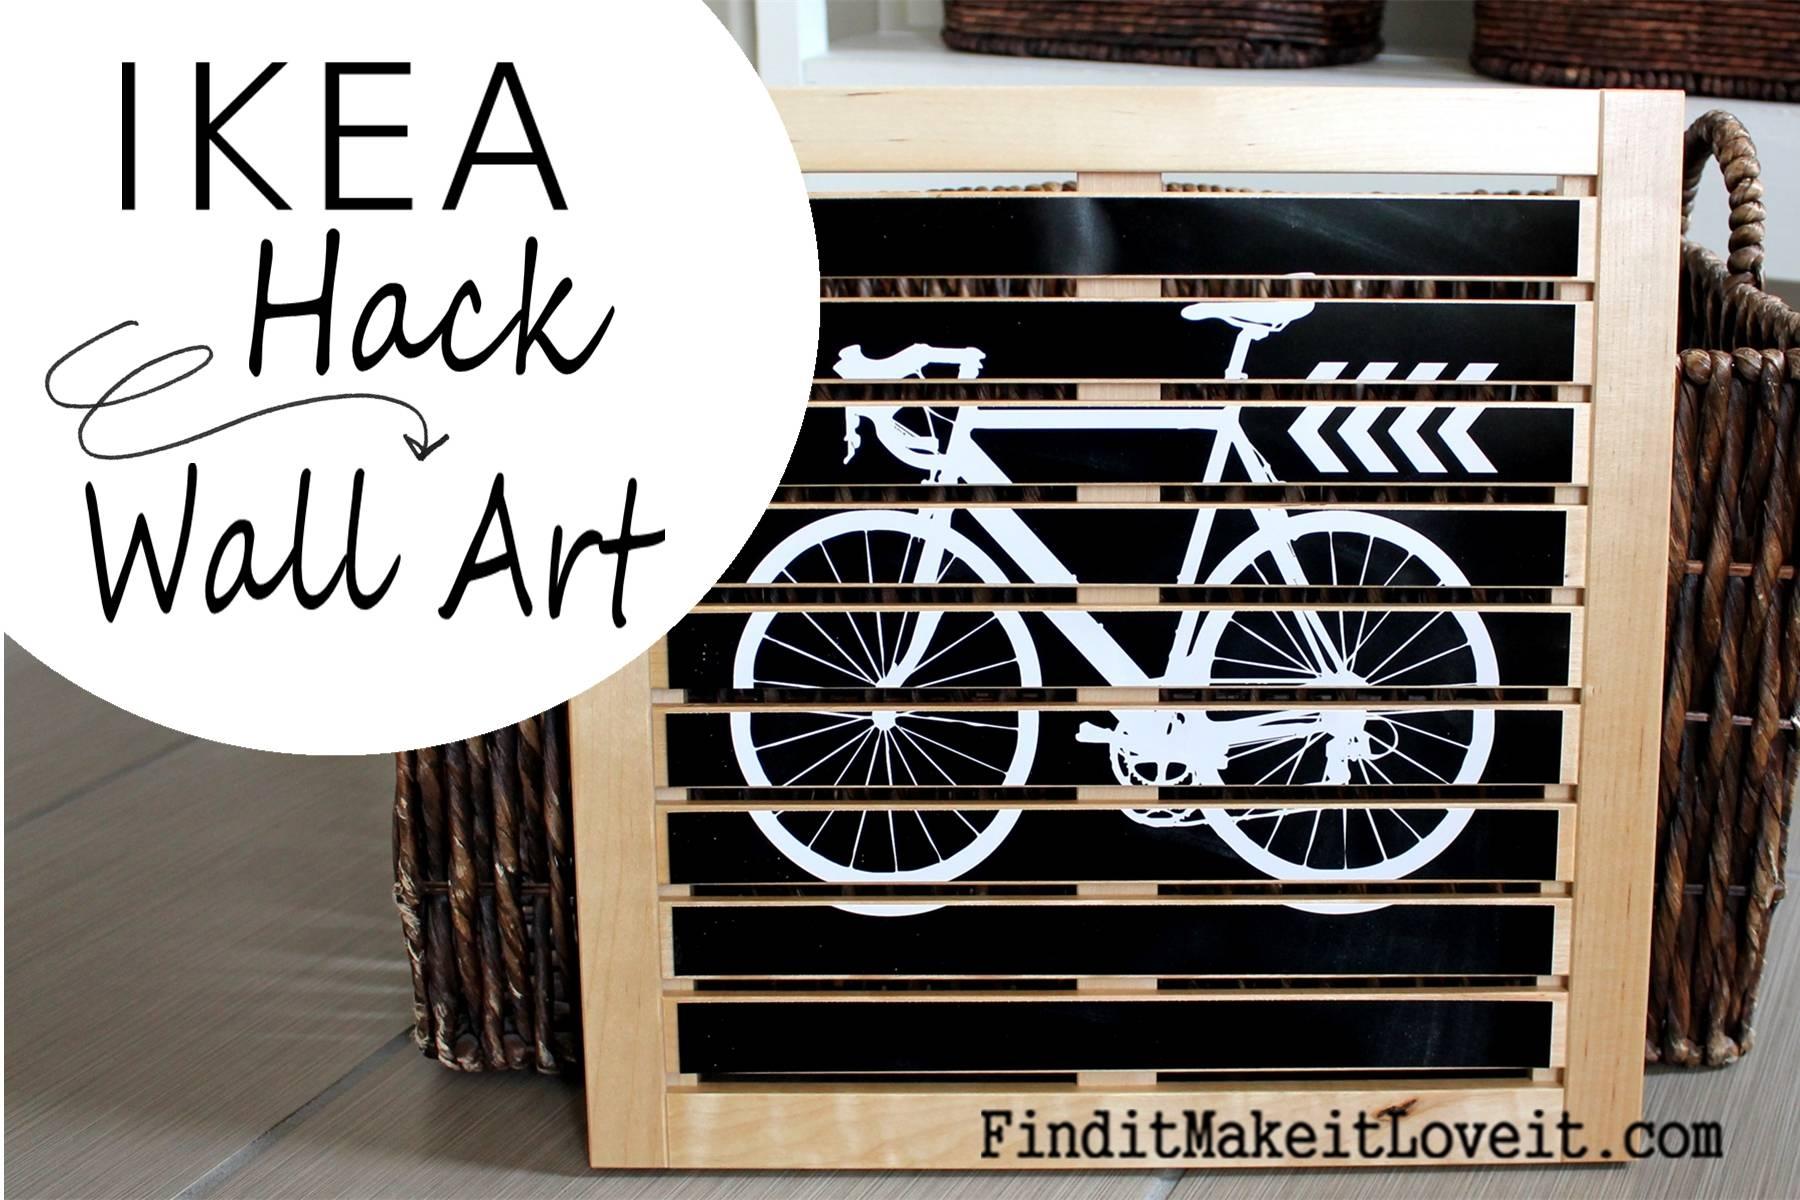 Diy Wall Art (ikea Hack) – Find It, Make It, Love It Within Most Recent Ikea Metal Wall Art (View 10 of 20)